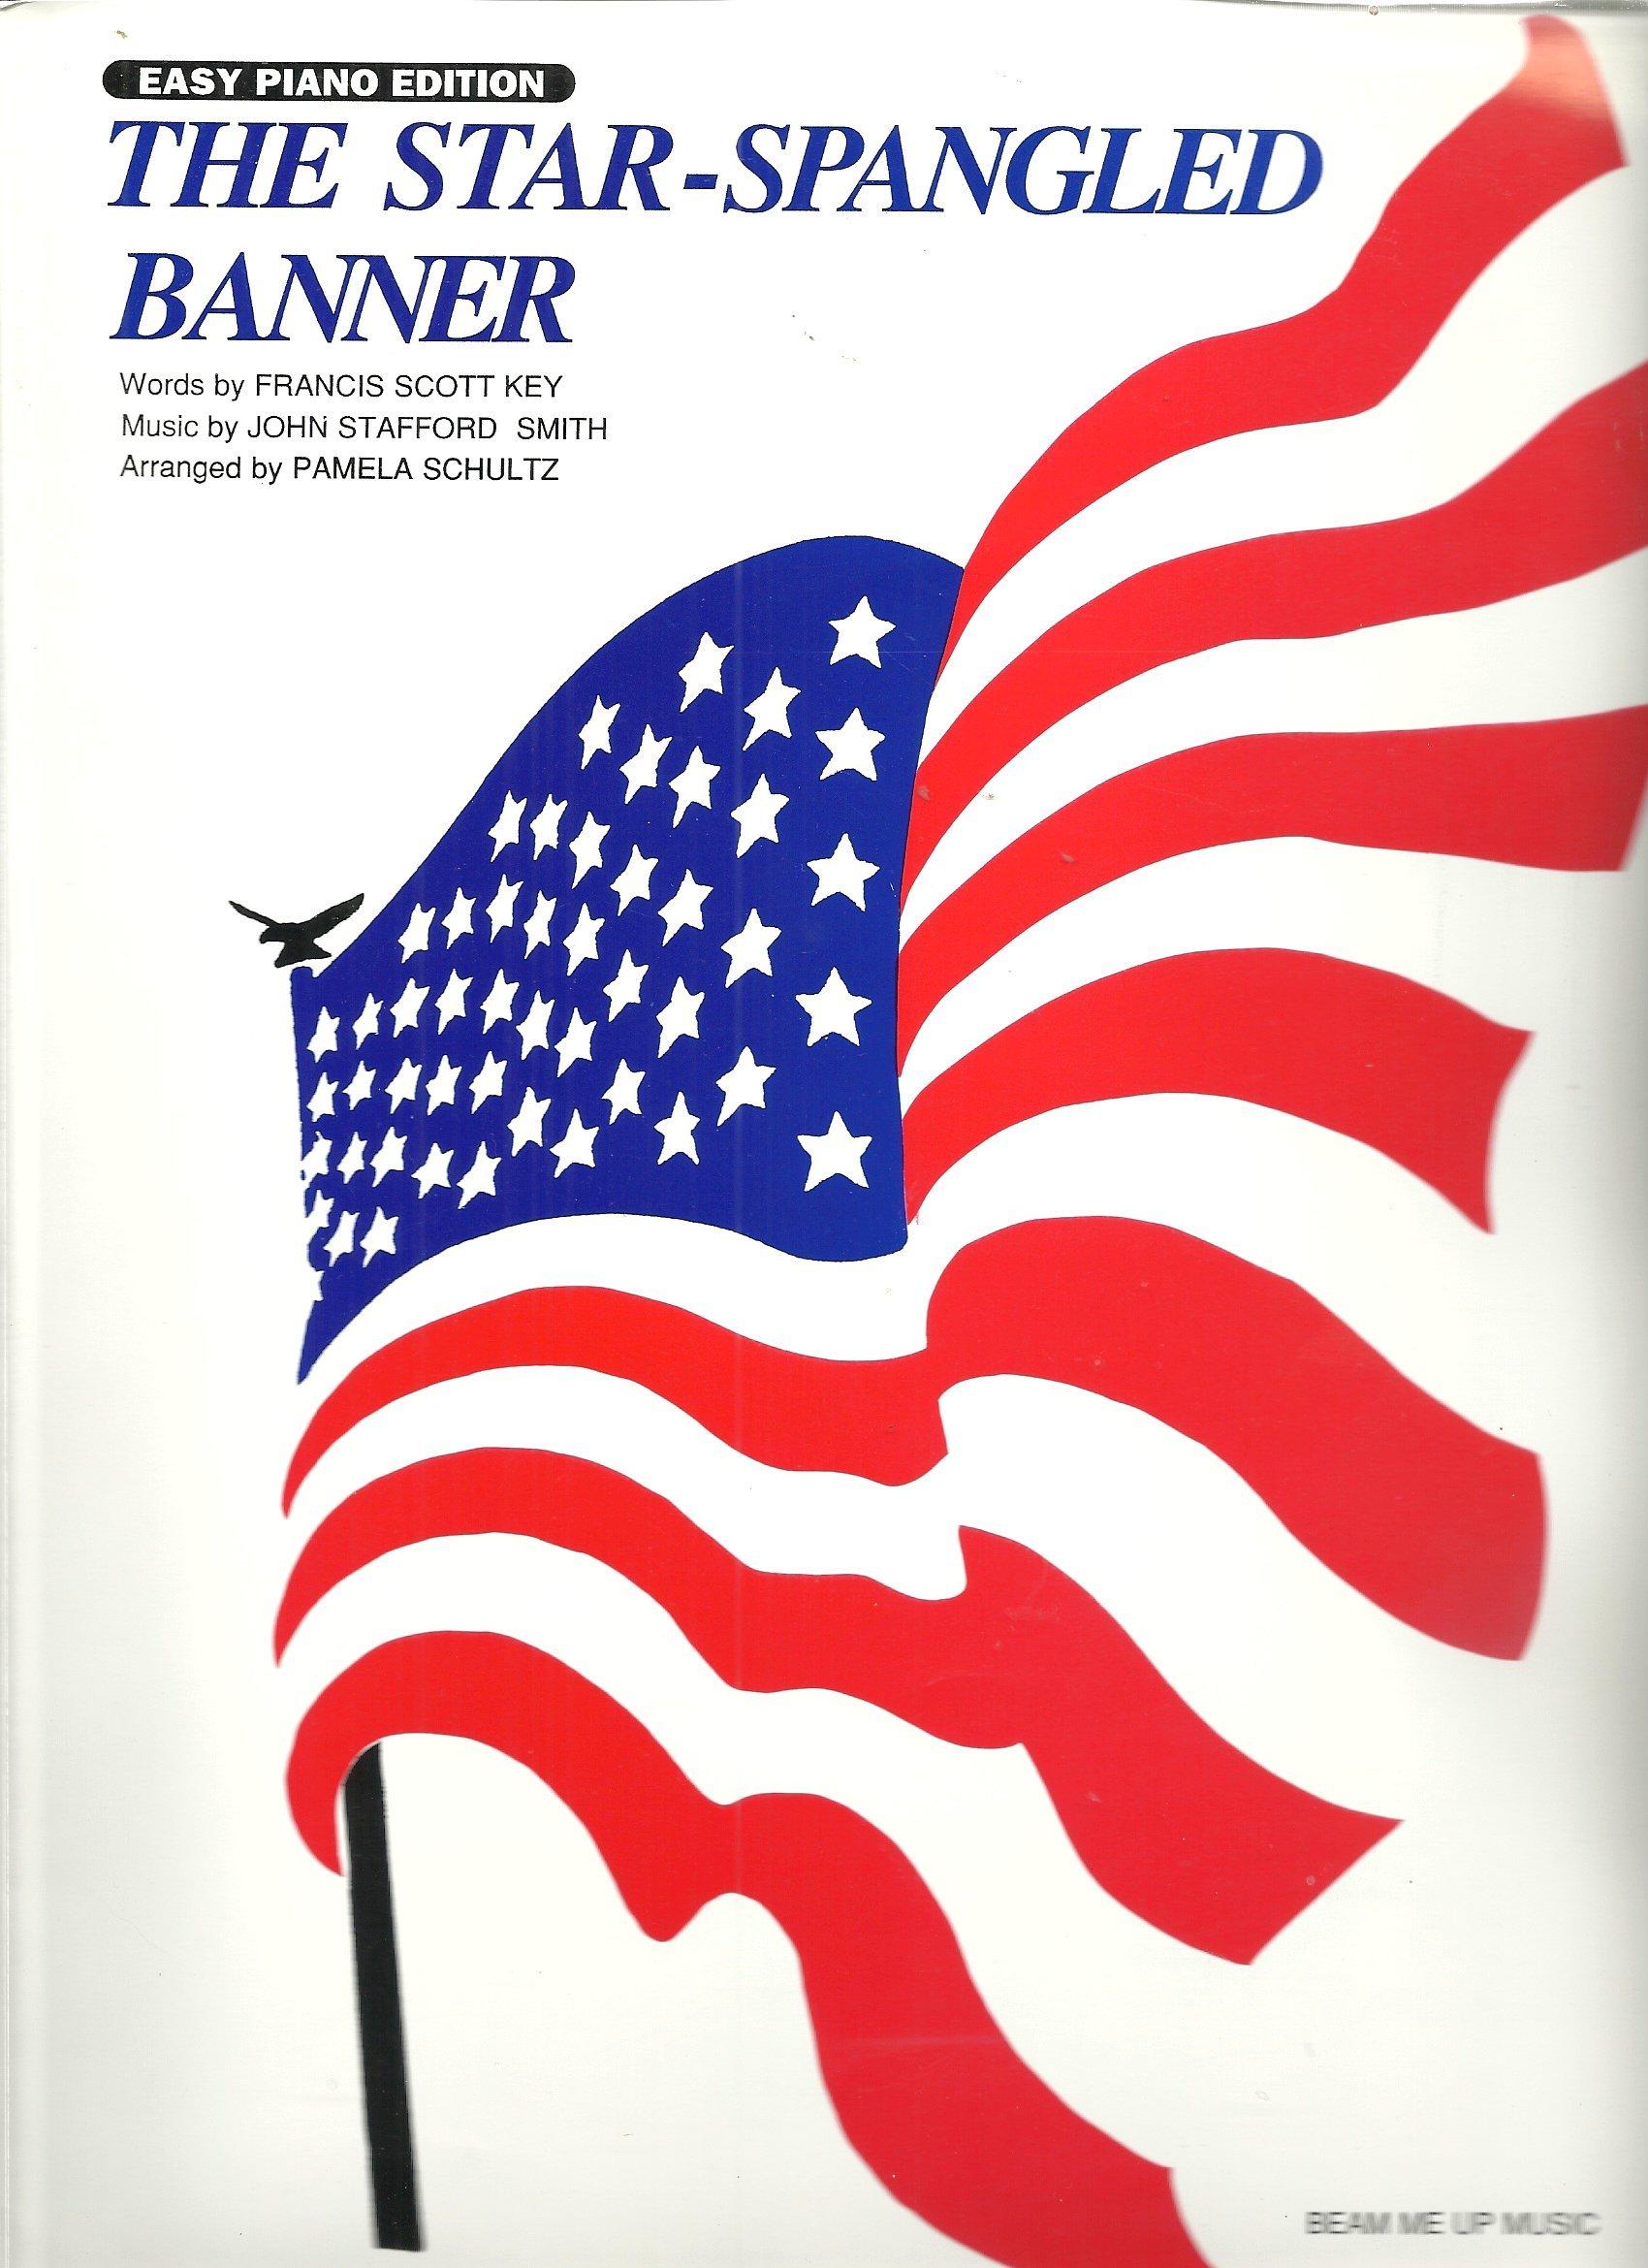 The Star Spangled Banner Easy Piano Edition Francis Scott Key John Stafford Smith Pamela Schultz Arranger Amazon Com Books